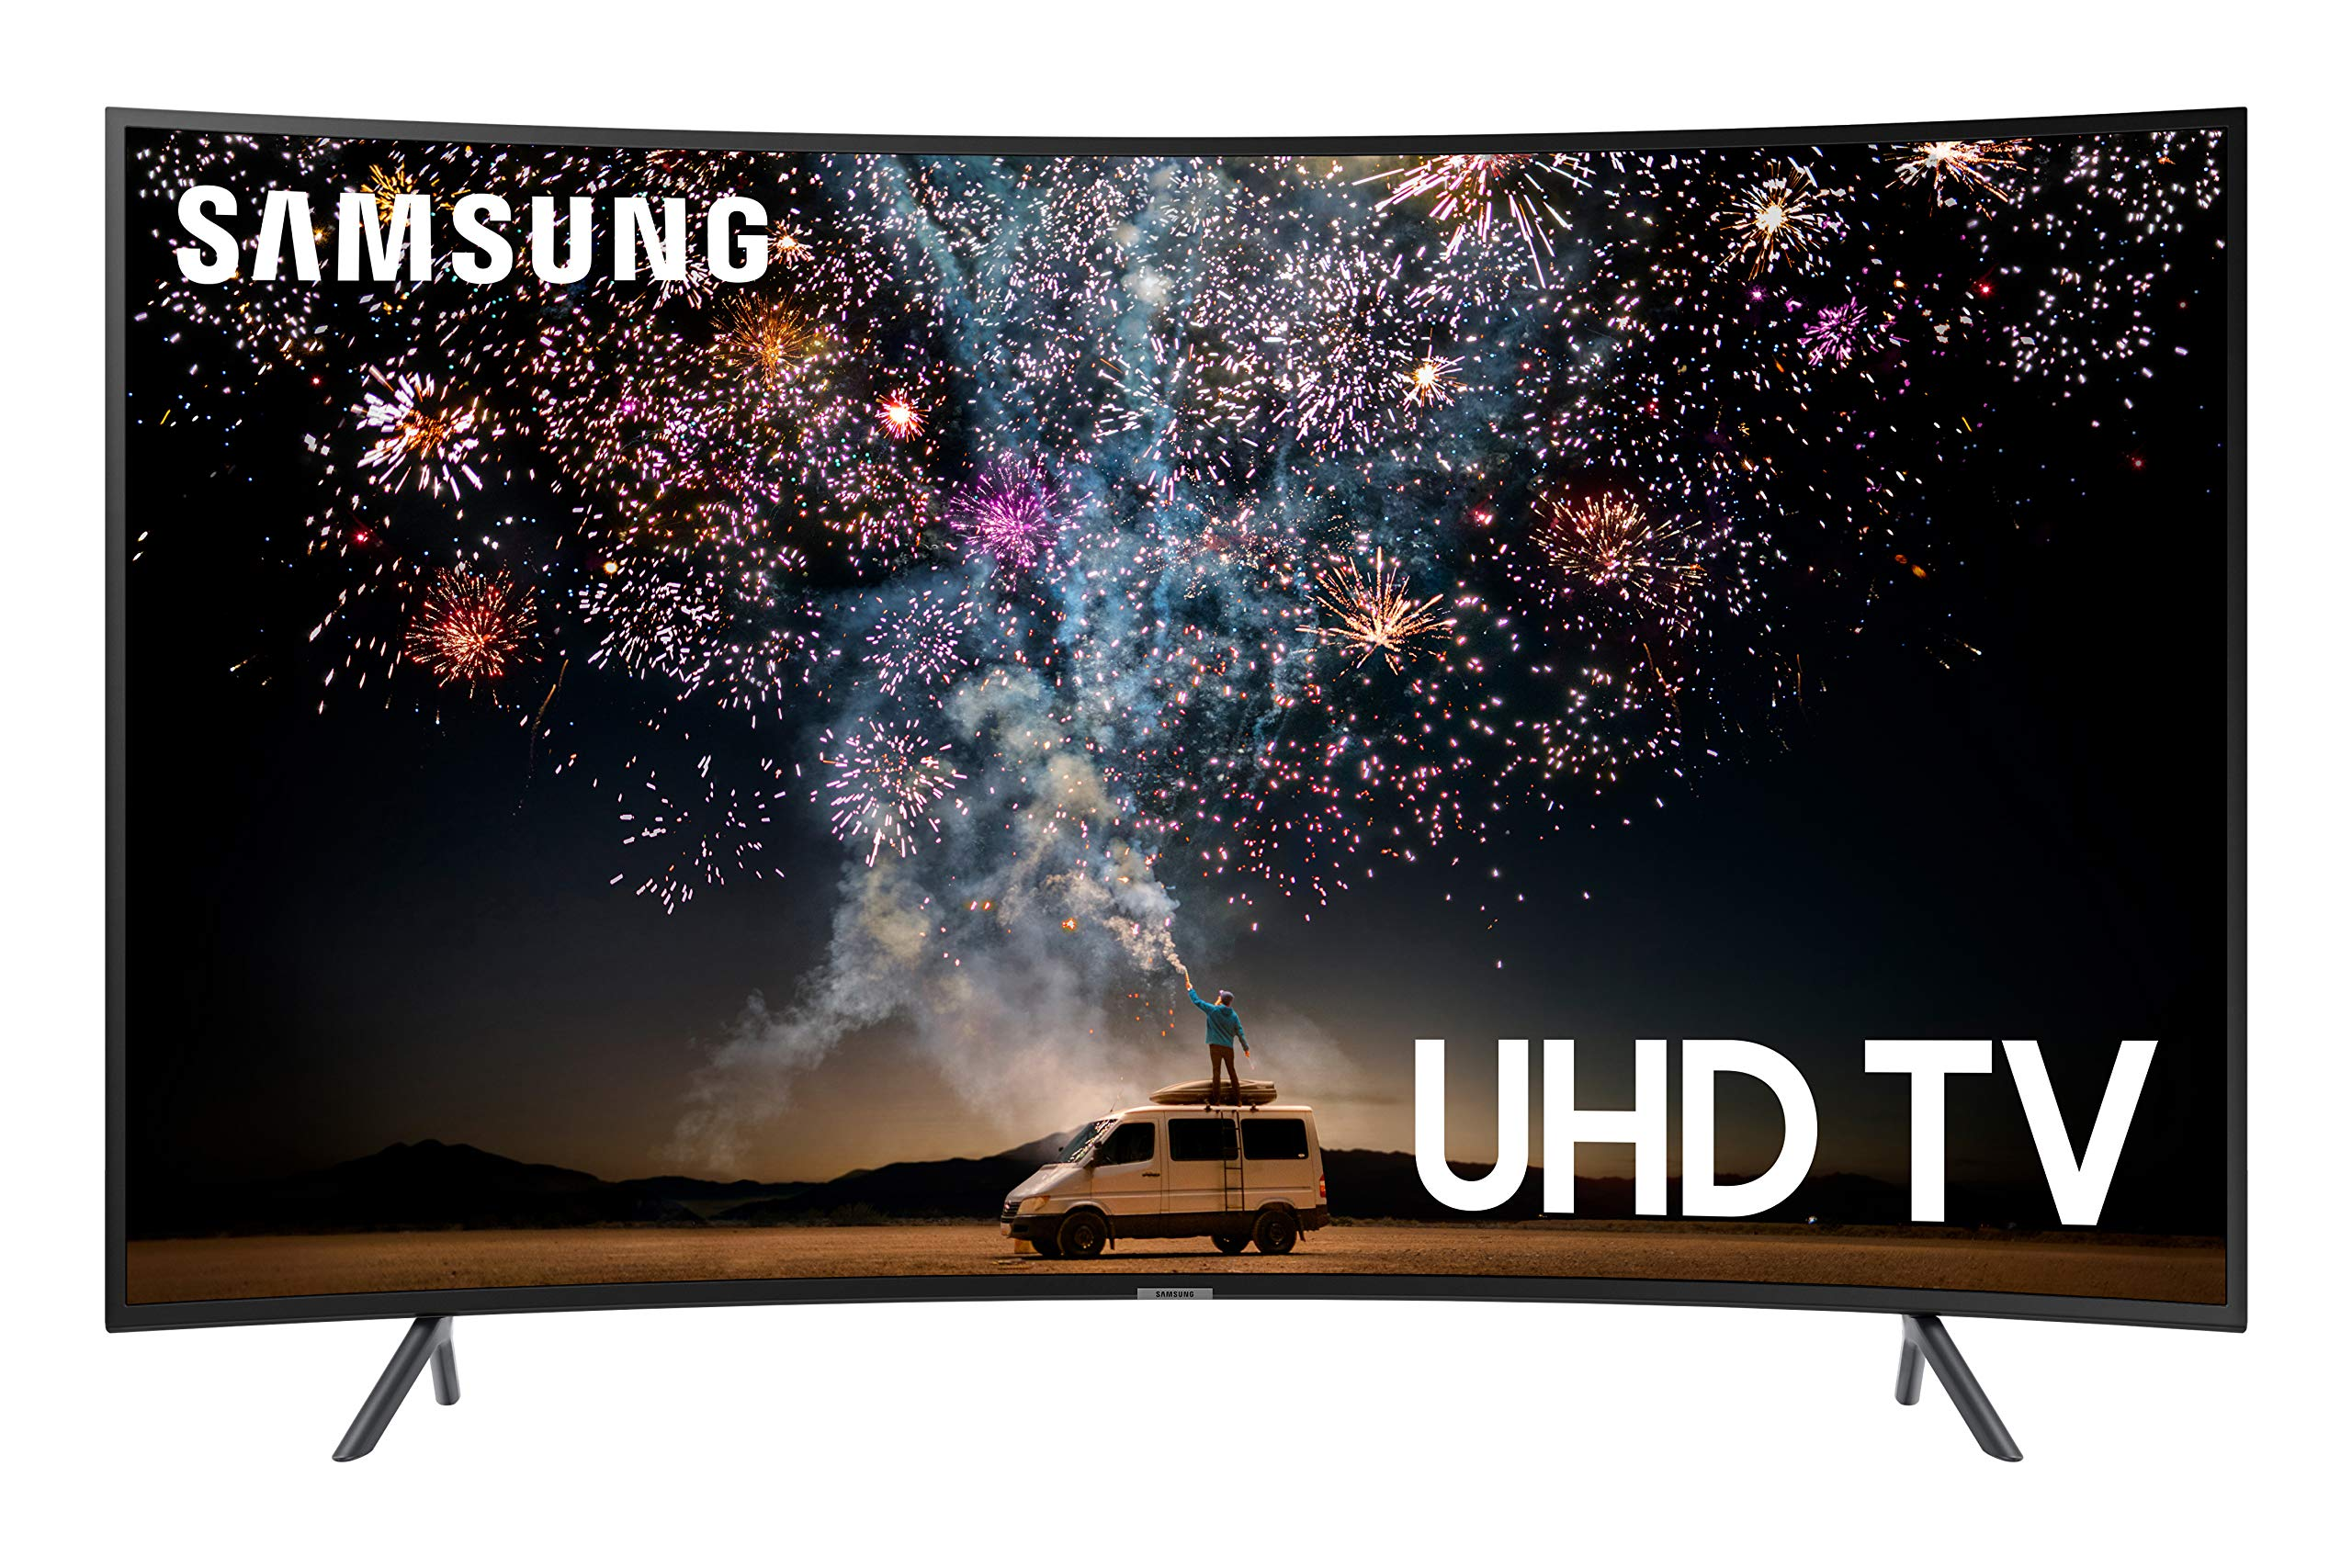 Samsung UN55RU7300FXZA CURVED UHD Smart